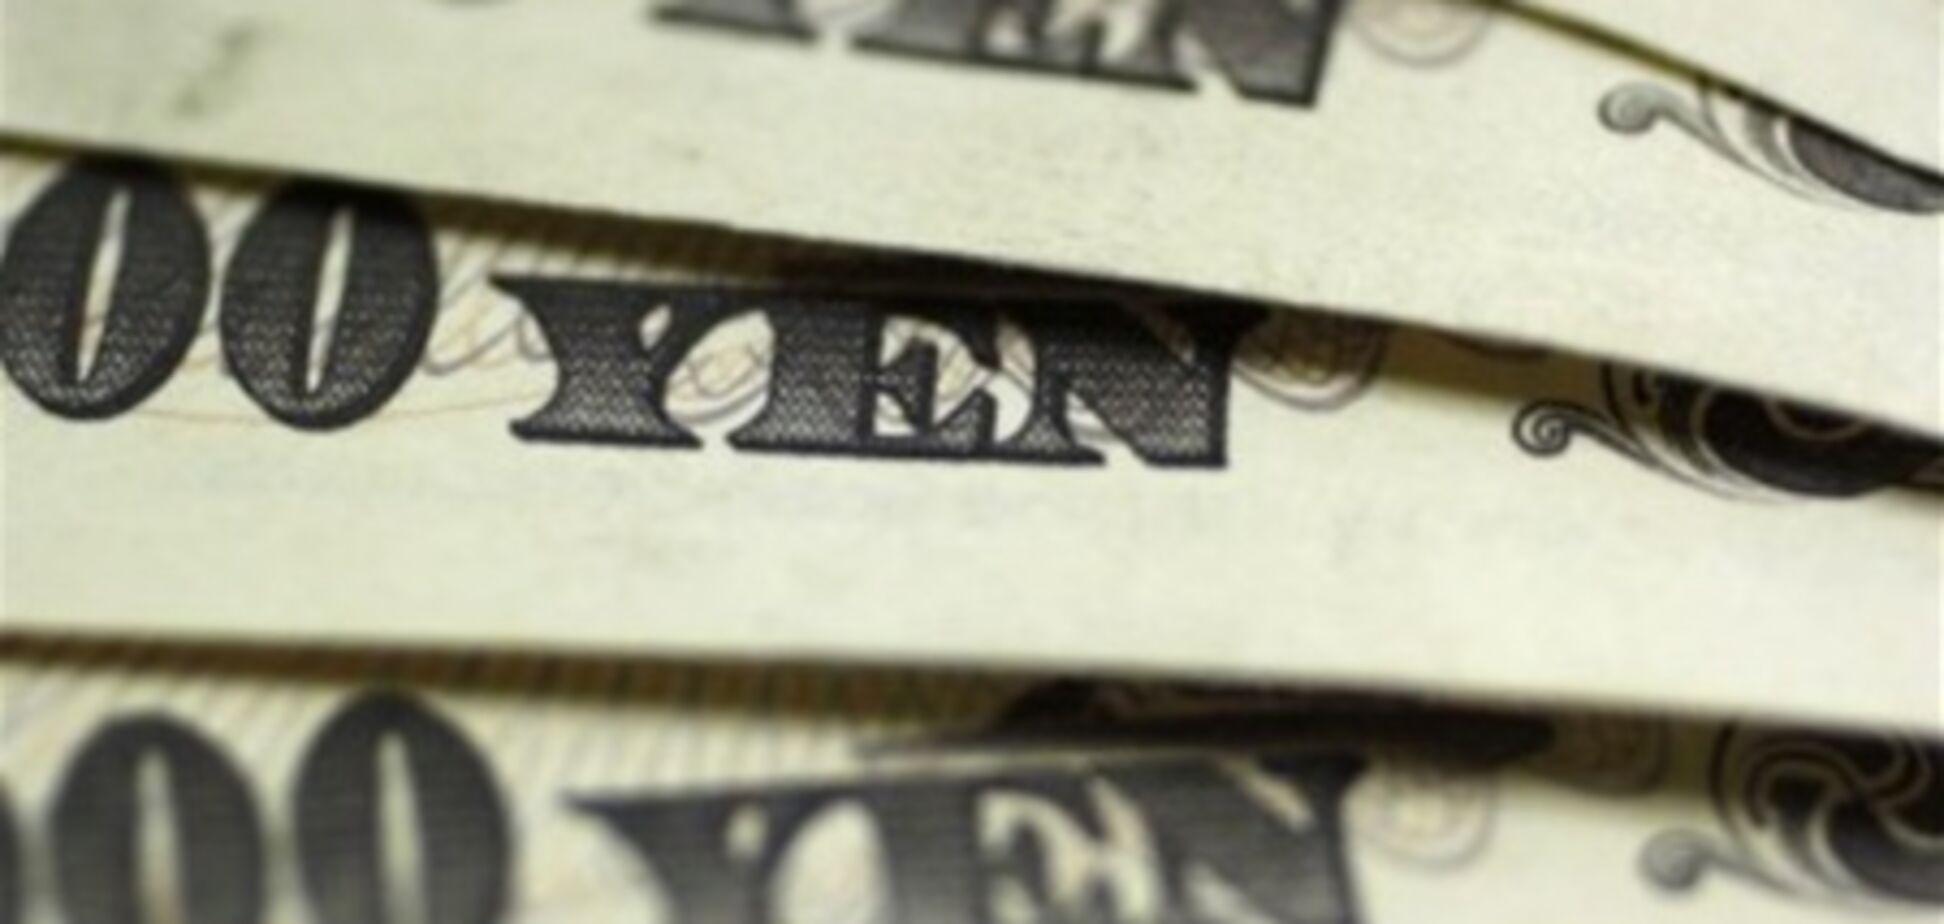 Рыбак из японской деревни поймал в мешок с 11 млн йен